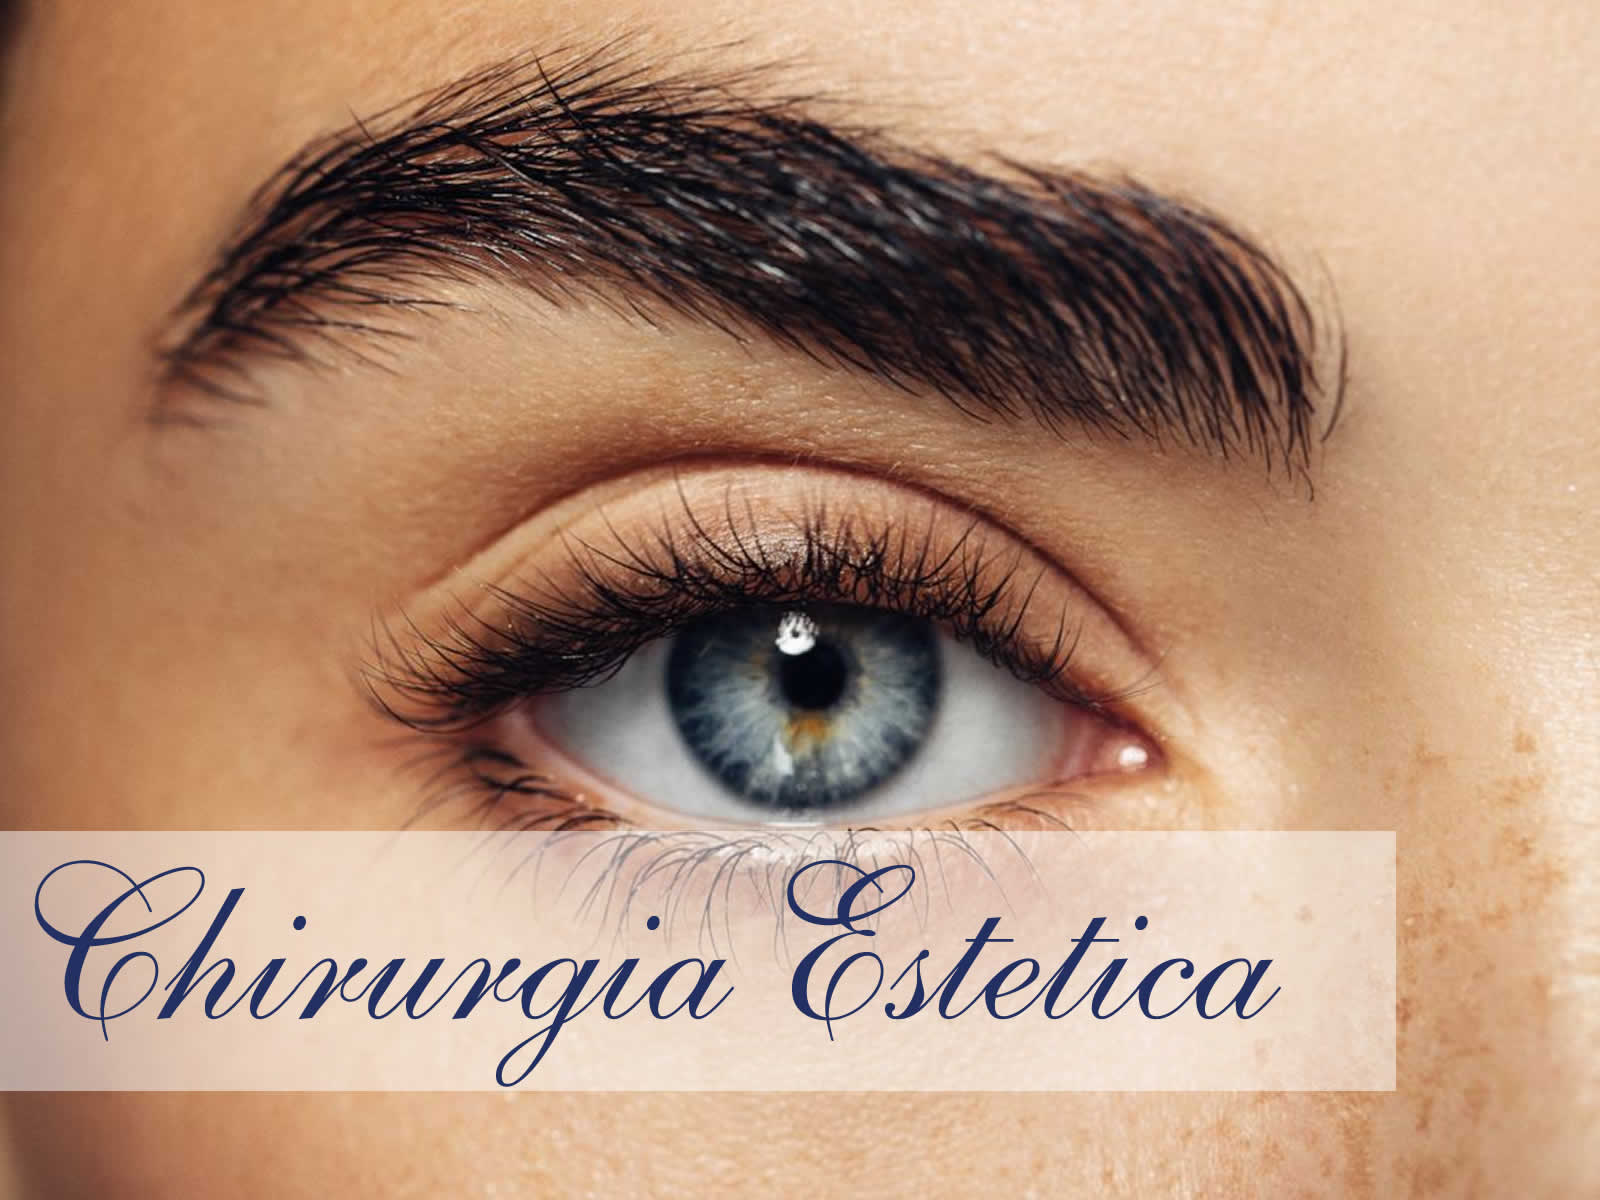 Giustiniana - Chirurgo Estetico: Blefaroplastica a Giustiniana